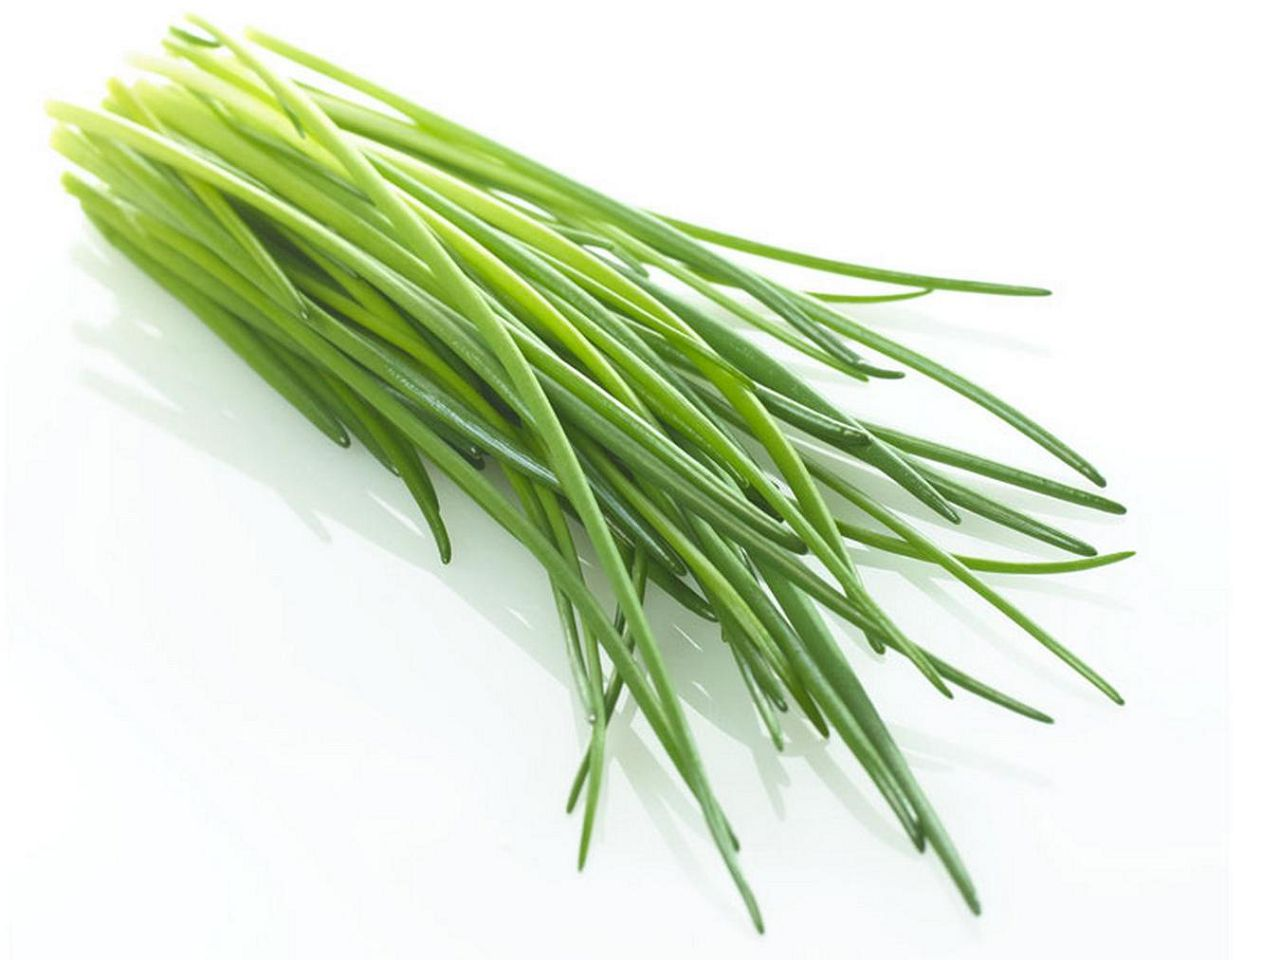 Перья зеленого лука